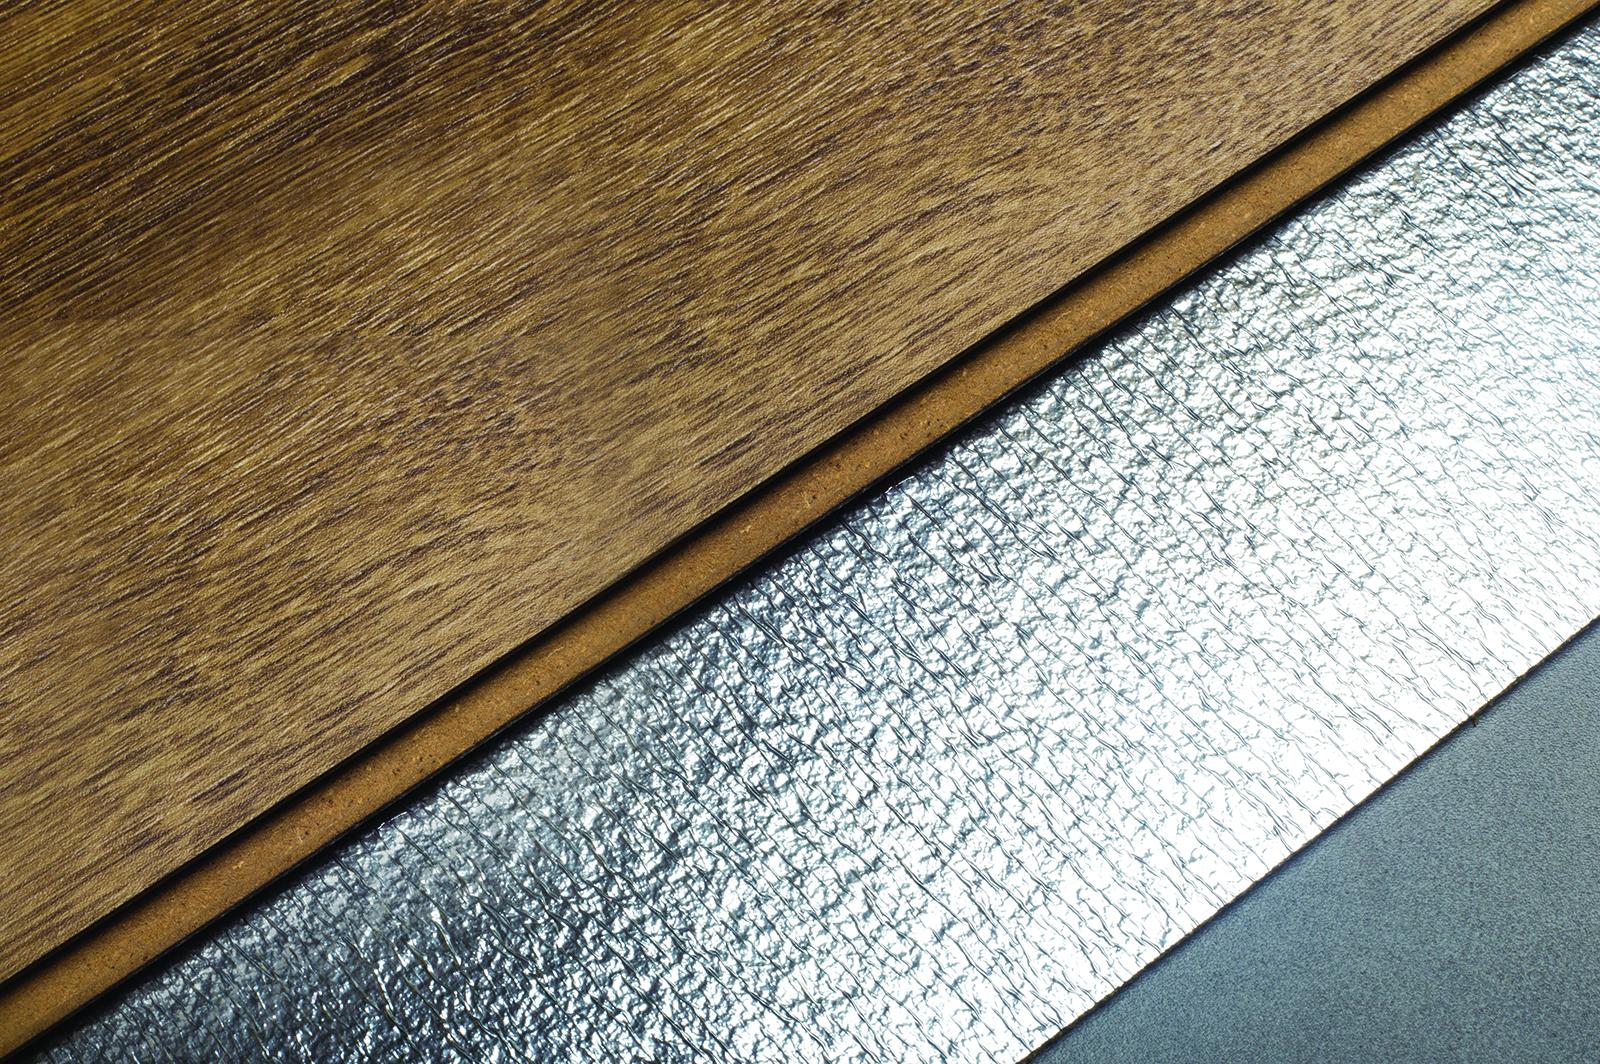 Silans ondervloer laminaat mm laminaat design shop